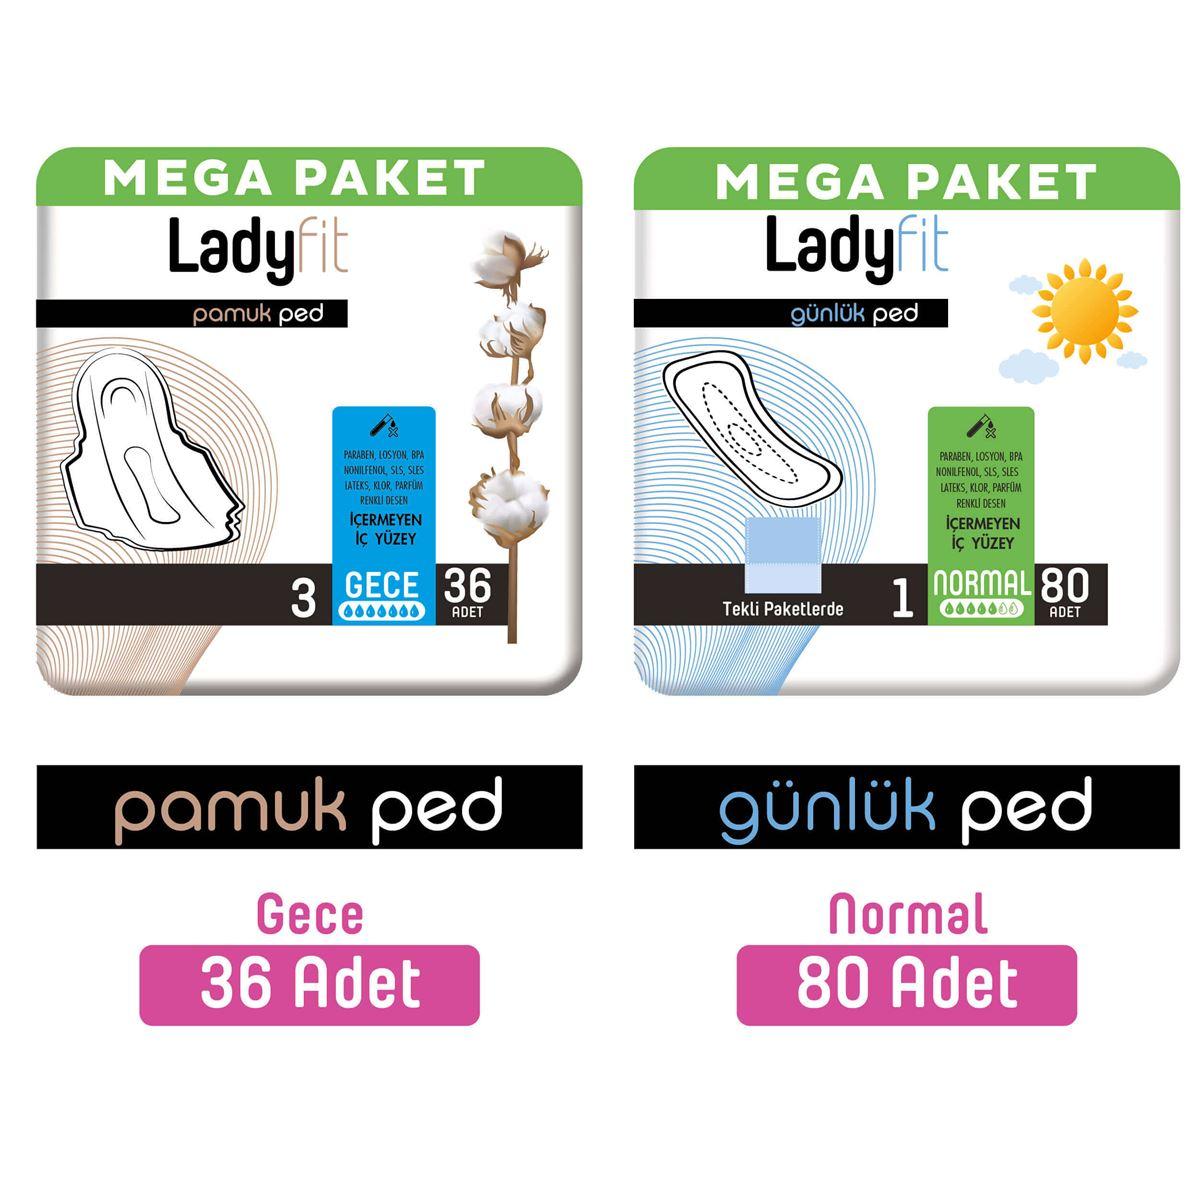 Ladyfit Pamuk Ped Mega Gece 36 Adet + Günlük Ped Mega Normal 80 Adet